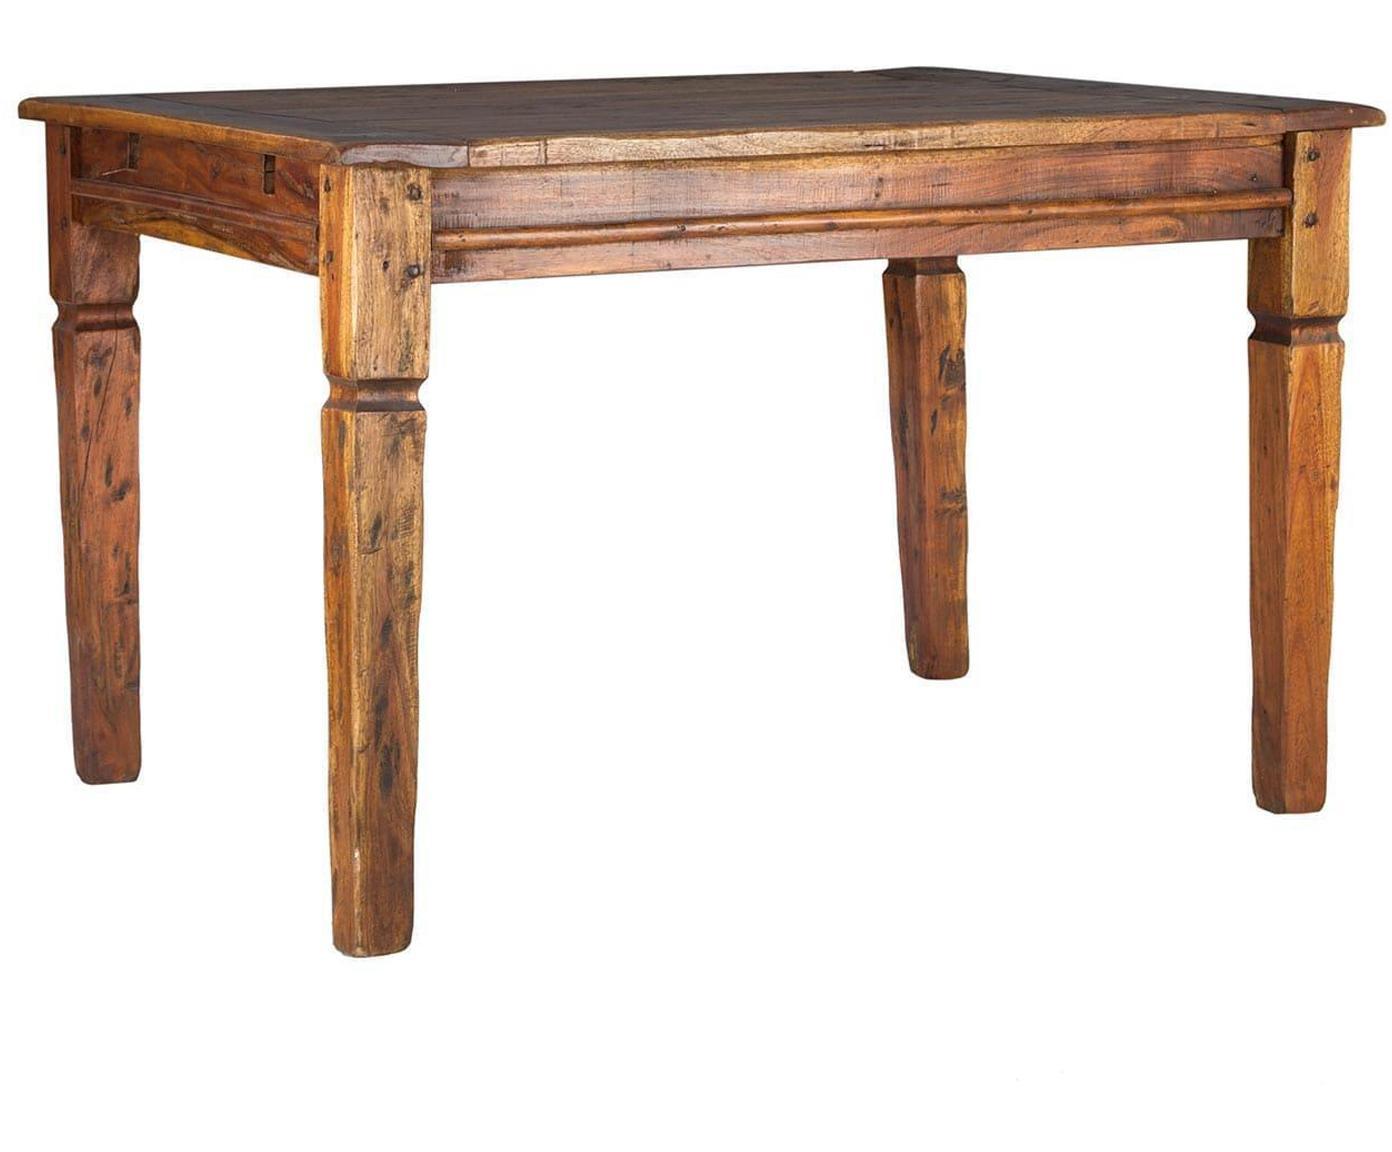 Mesa de comedor extensible Chateaux, Estructura: madera de abedul, Asiento: ratán natural, acabado de, Marrón envejecido, An 200 x F 90 cm